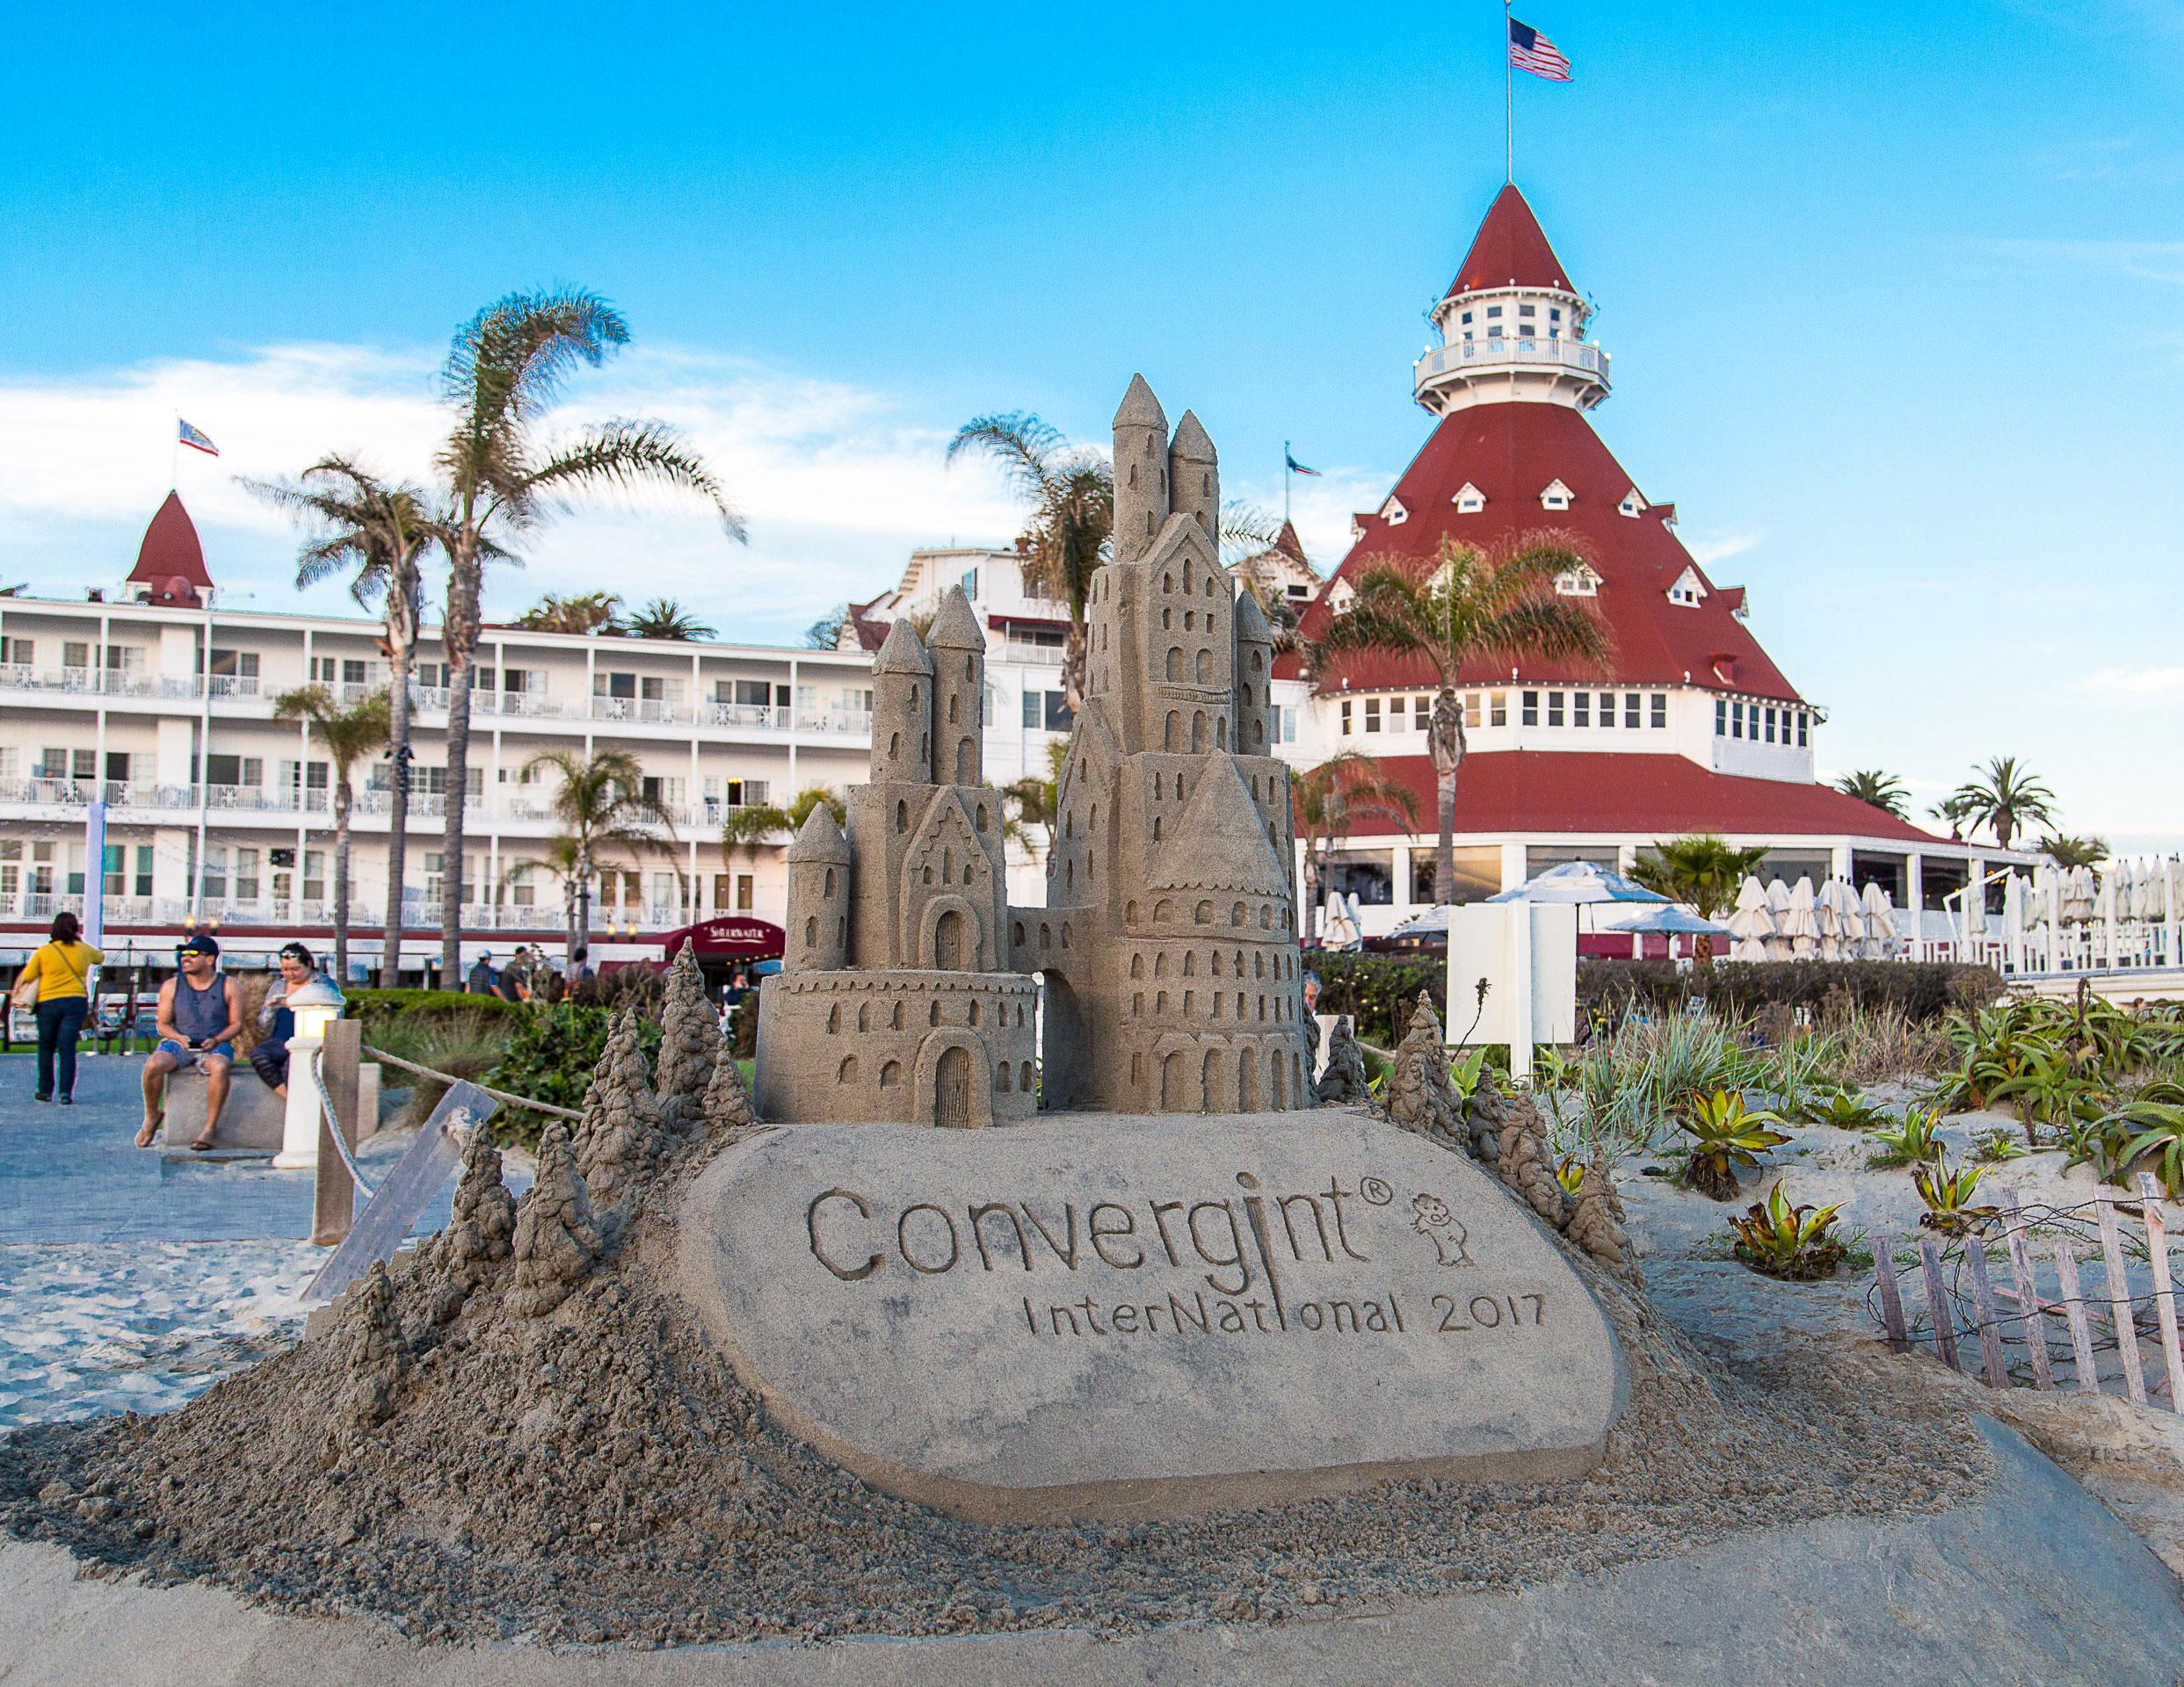 Convergint International 2017 sandcastle at the beach